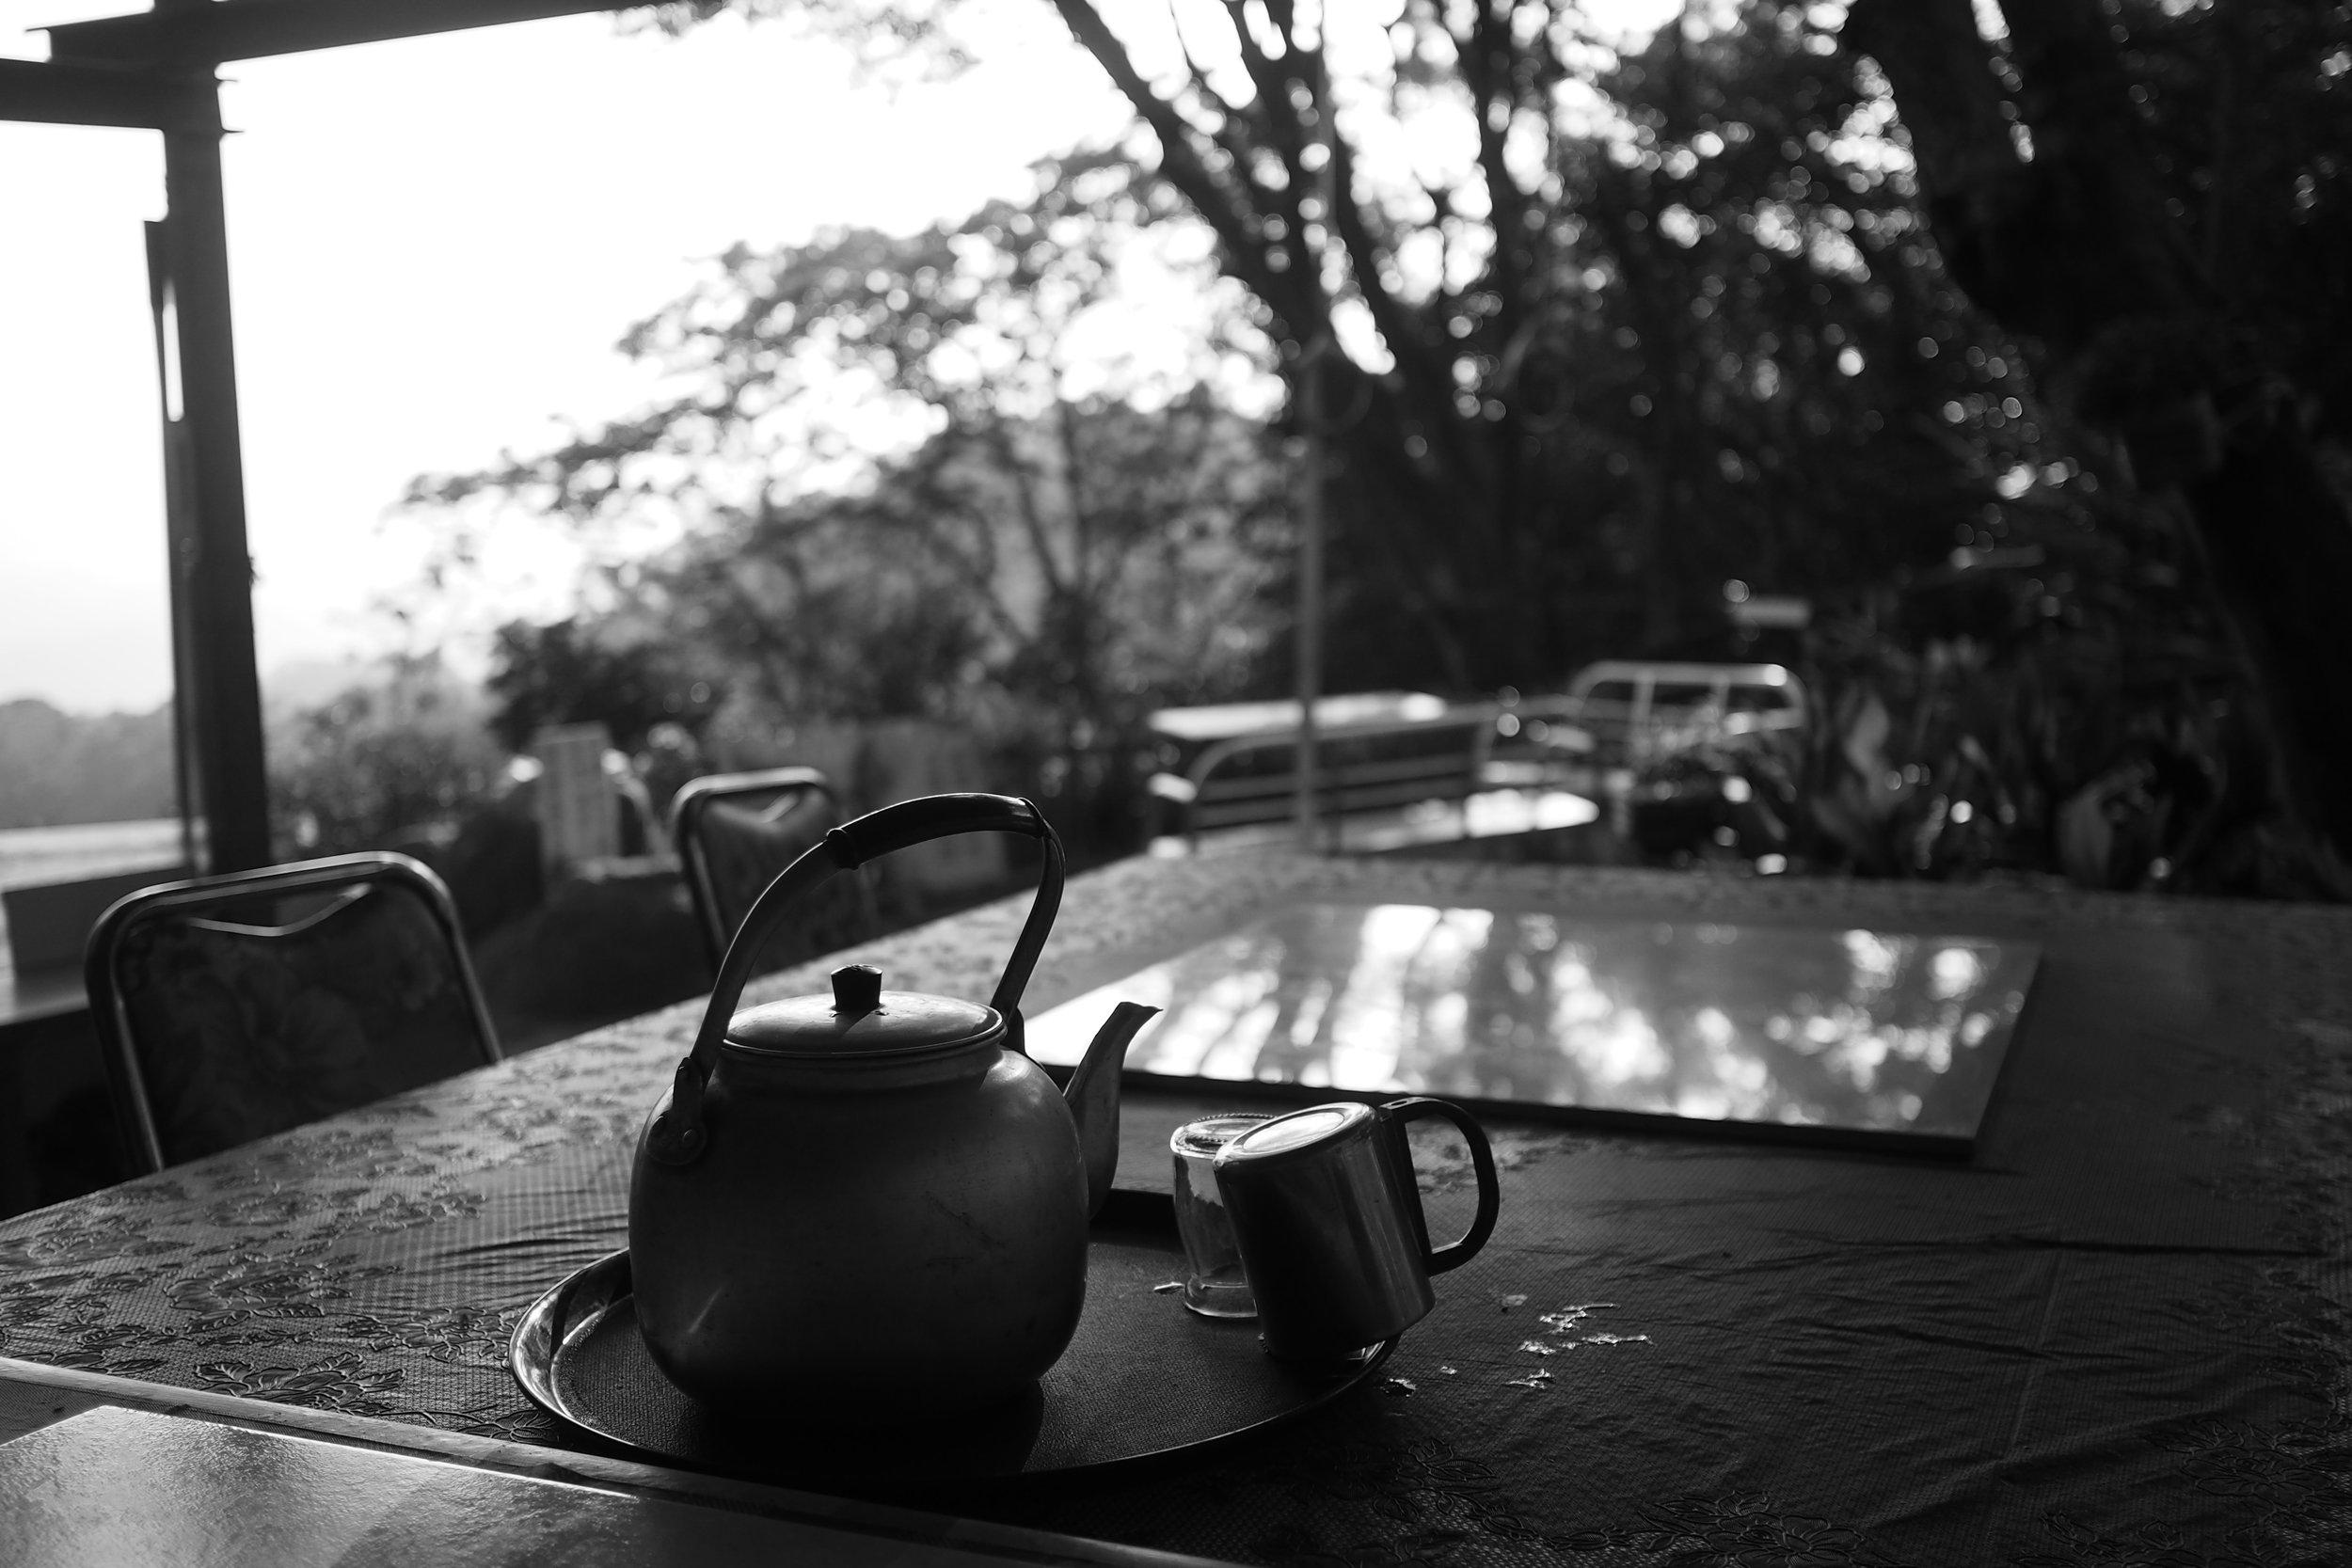 Tea & mountains. f1.8, ISO 200, 1/500, 35mm